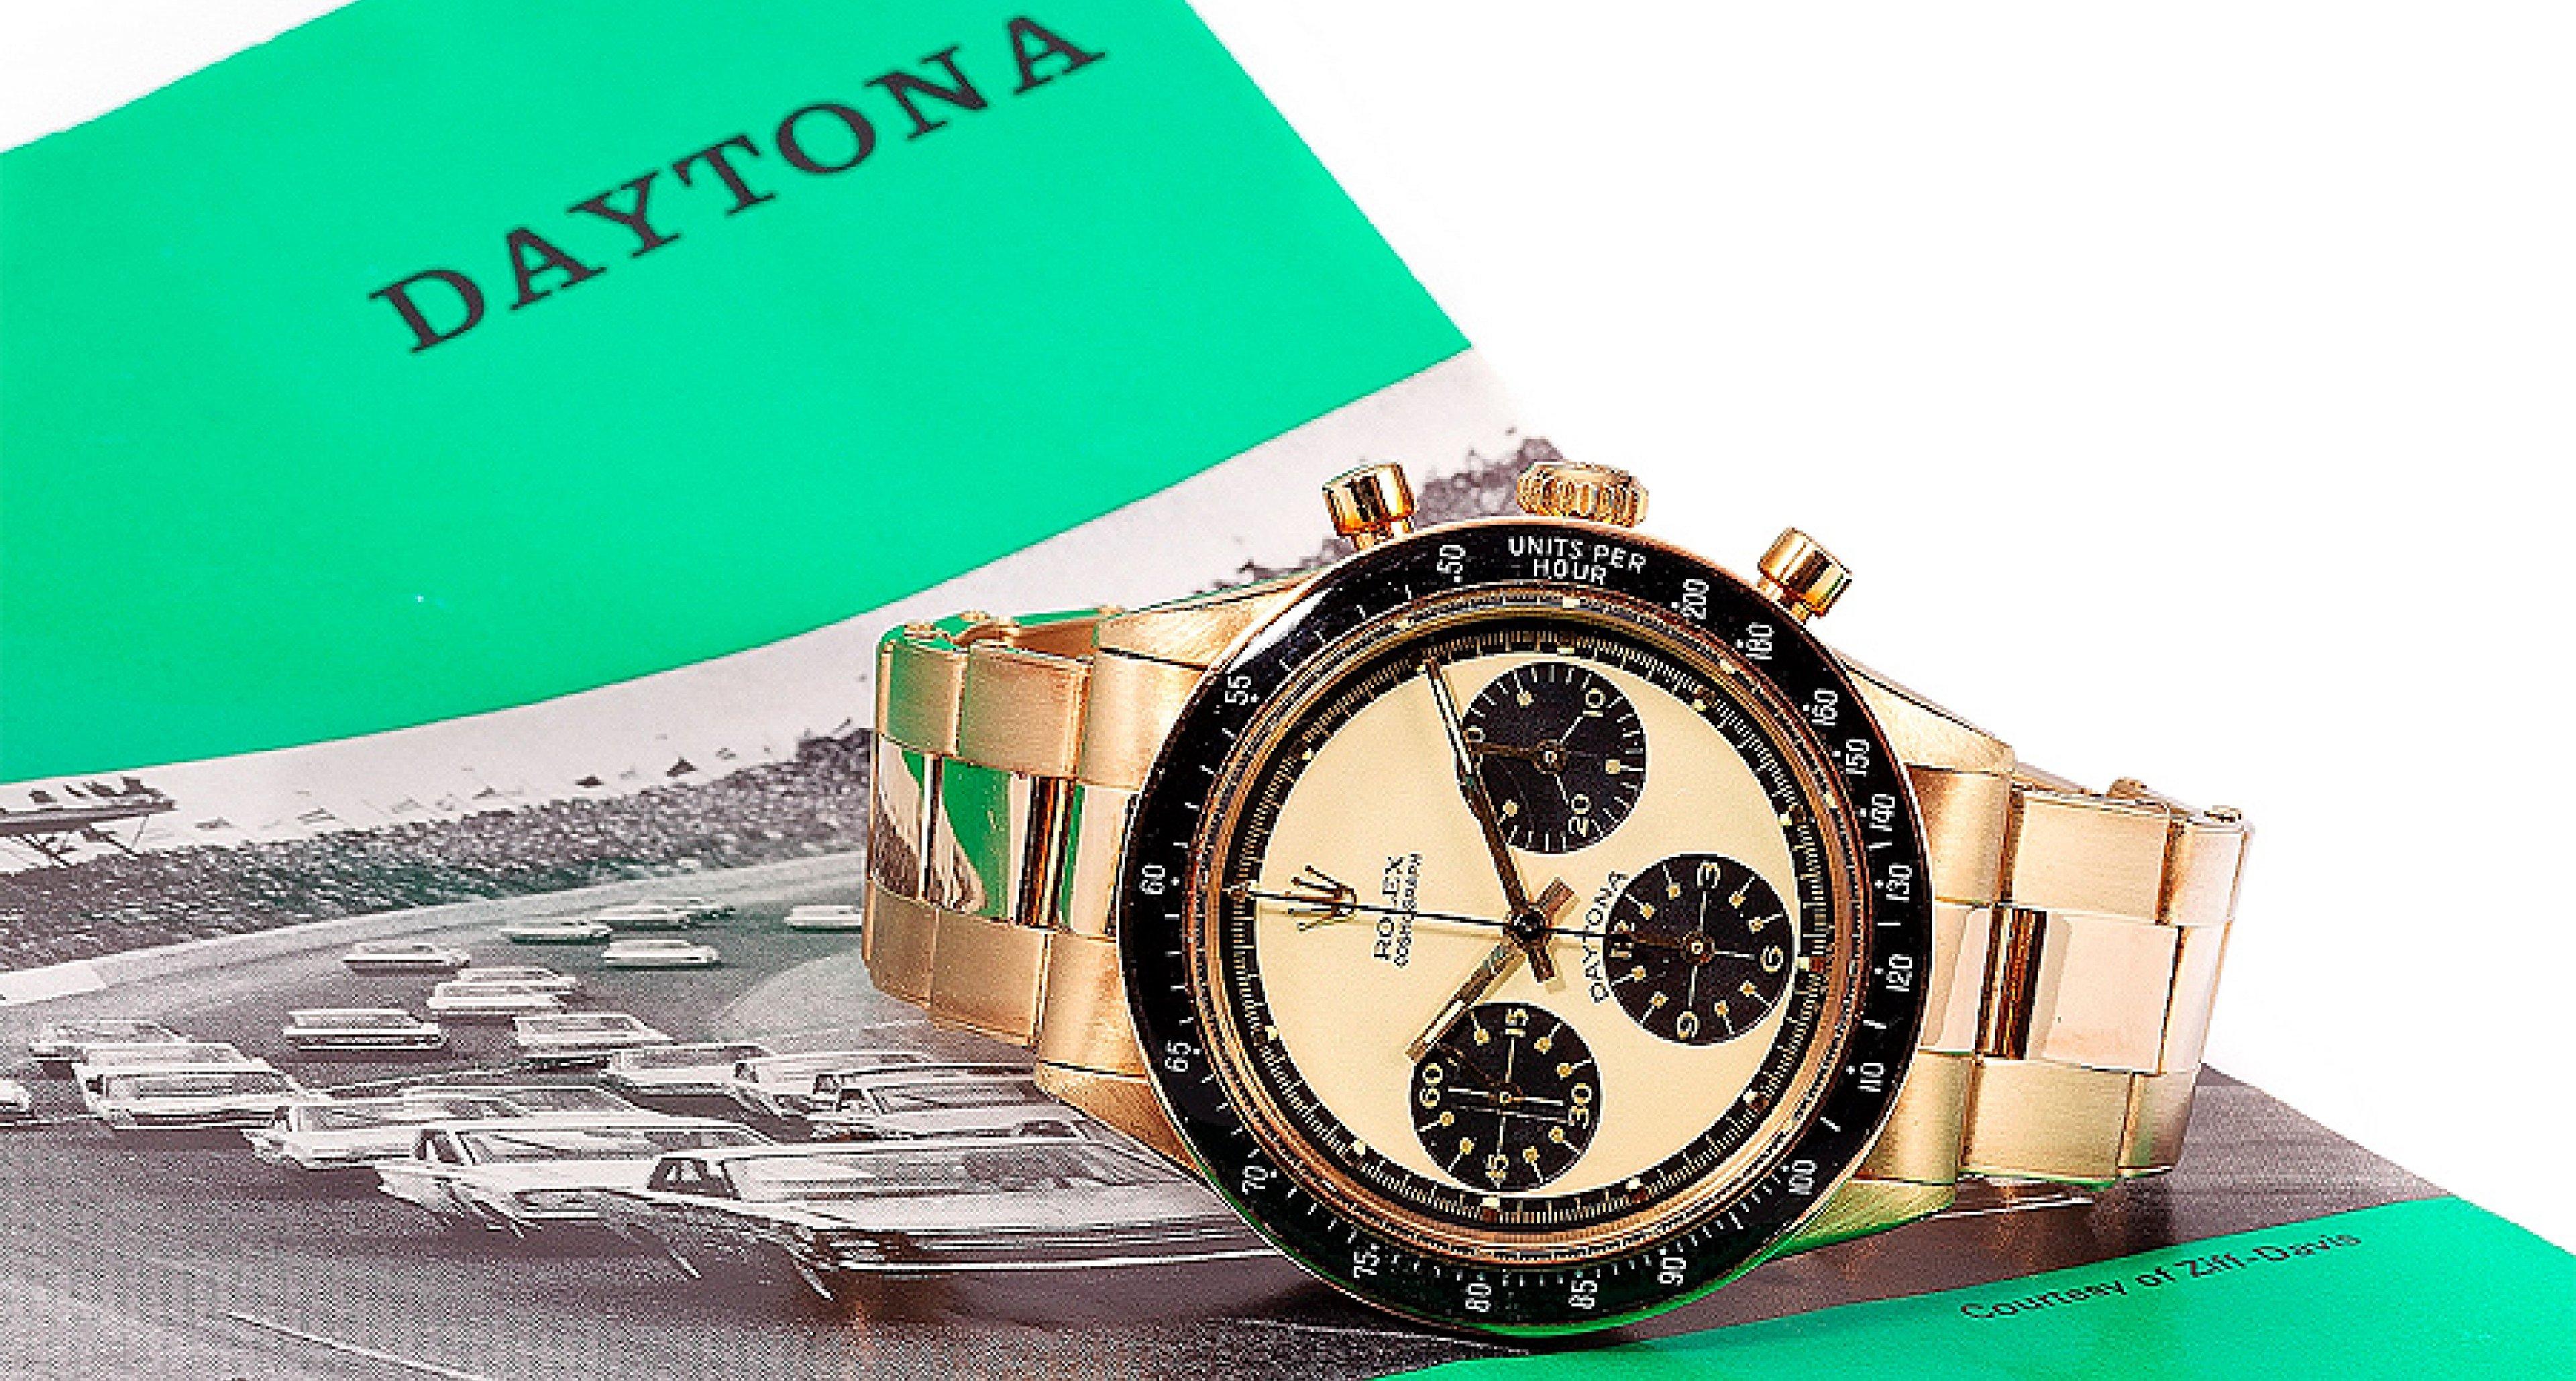 Rolex Daytonas at Bonhams' 8 December US sale